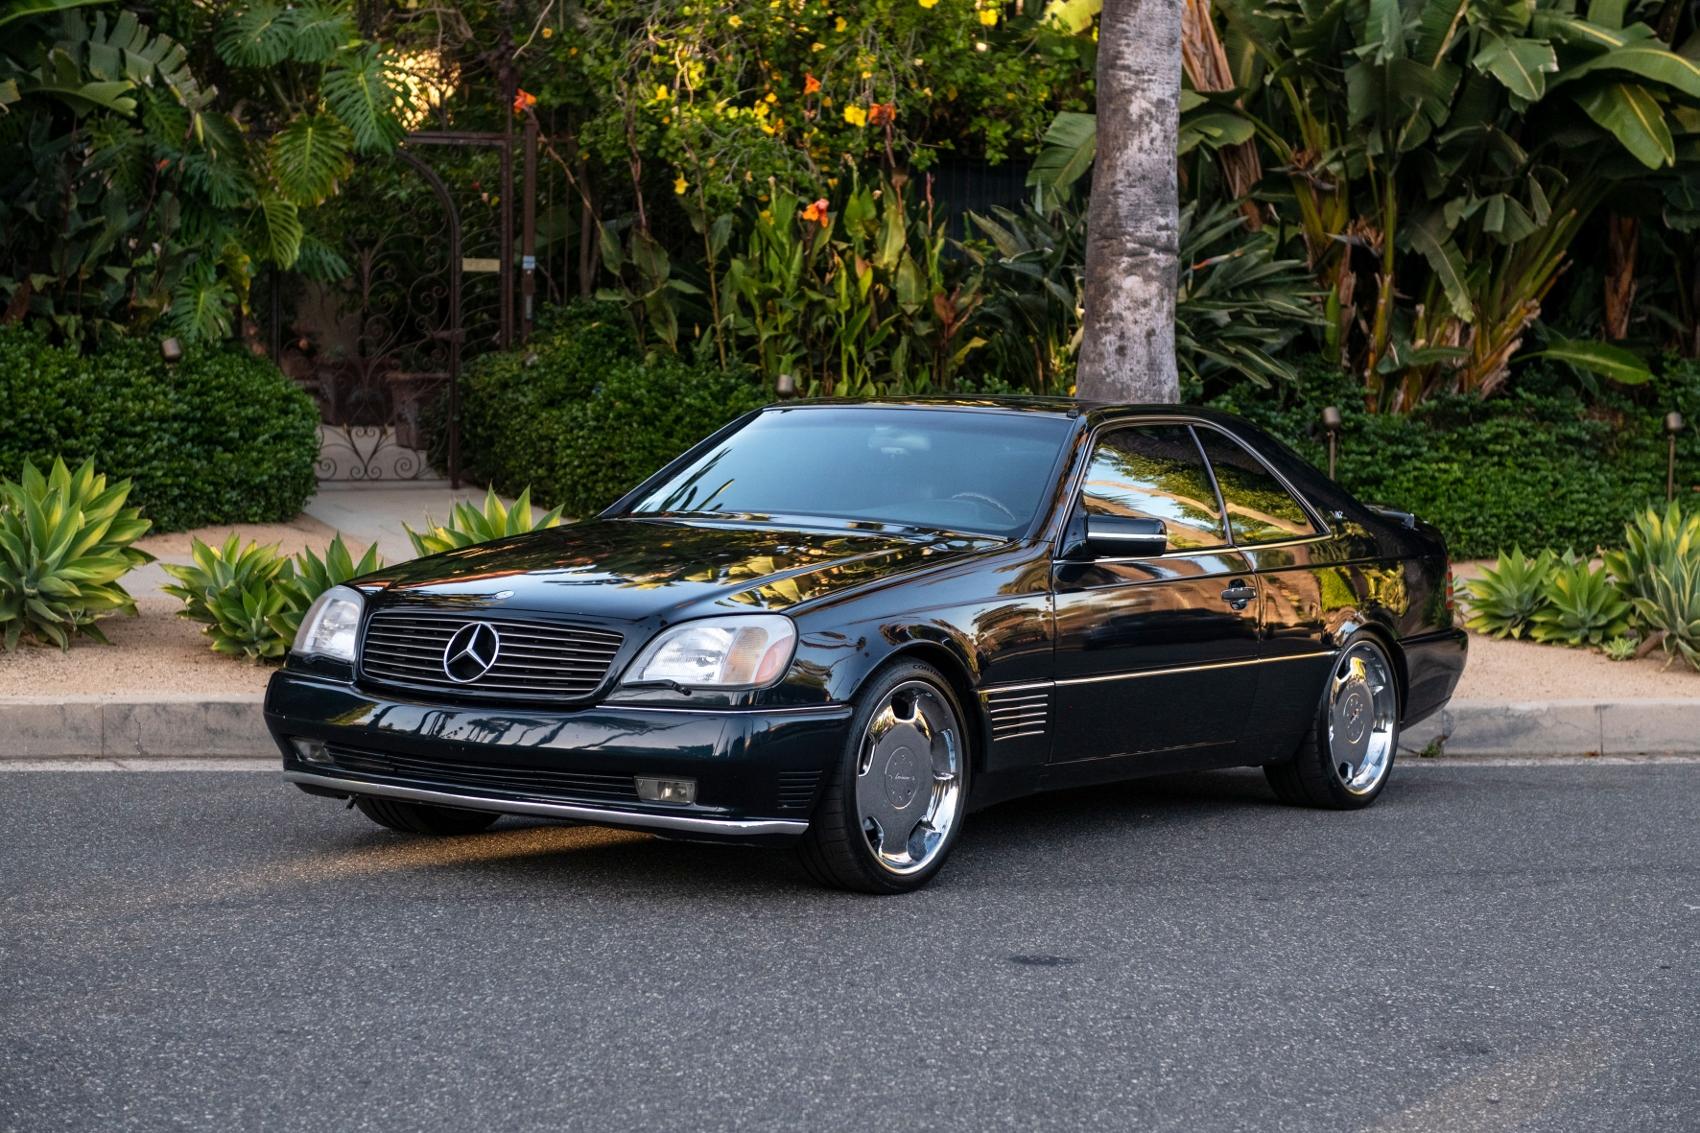 Pozrite si Mercedes S600 Michaela Jordana z roku 1996 UY8XNVpqO3 lorinsercl600ex-jordanfrontdiagonal